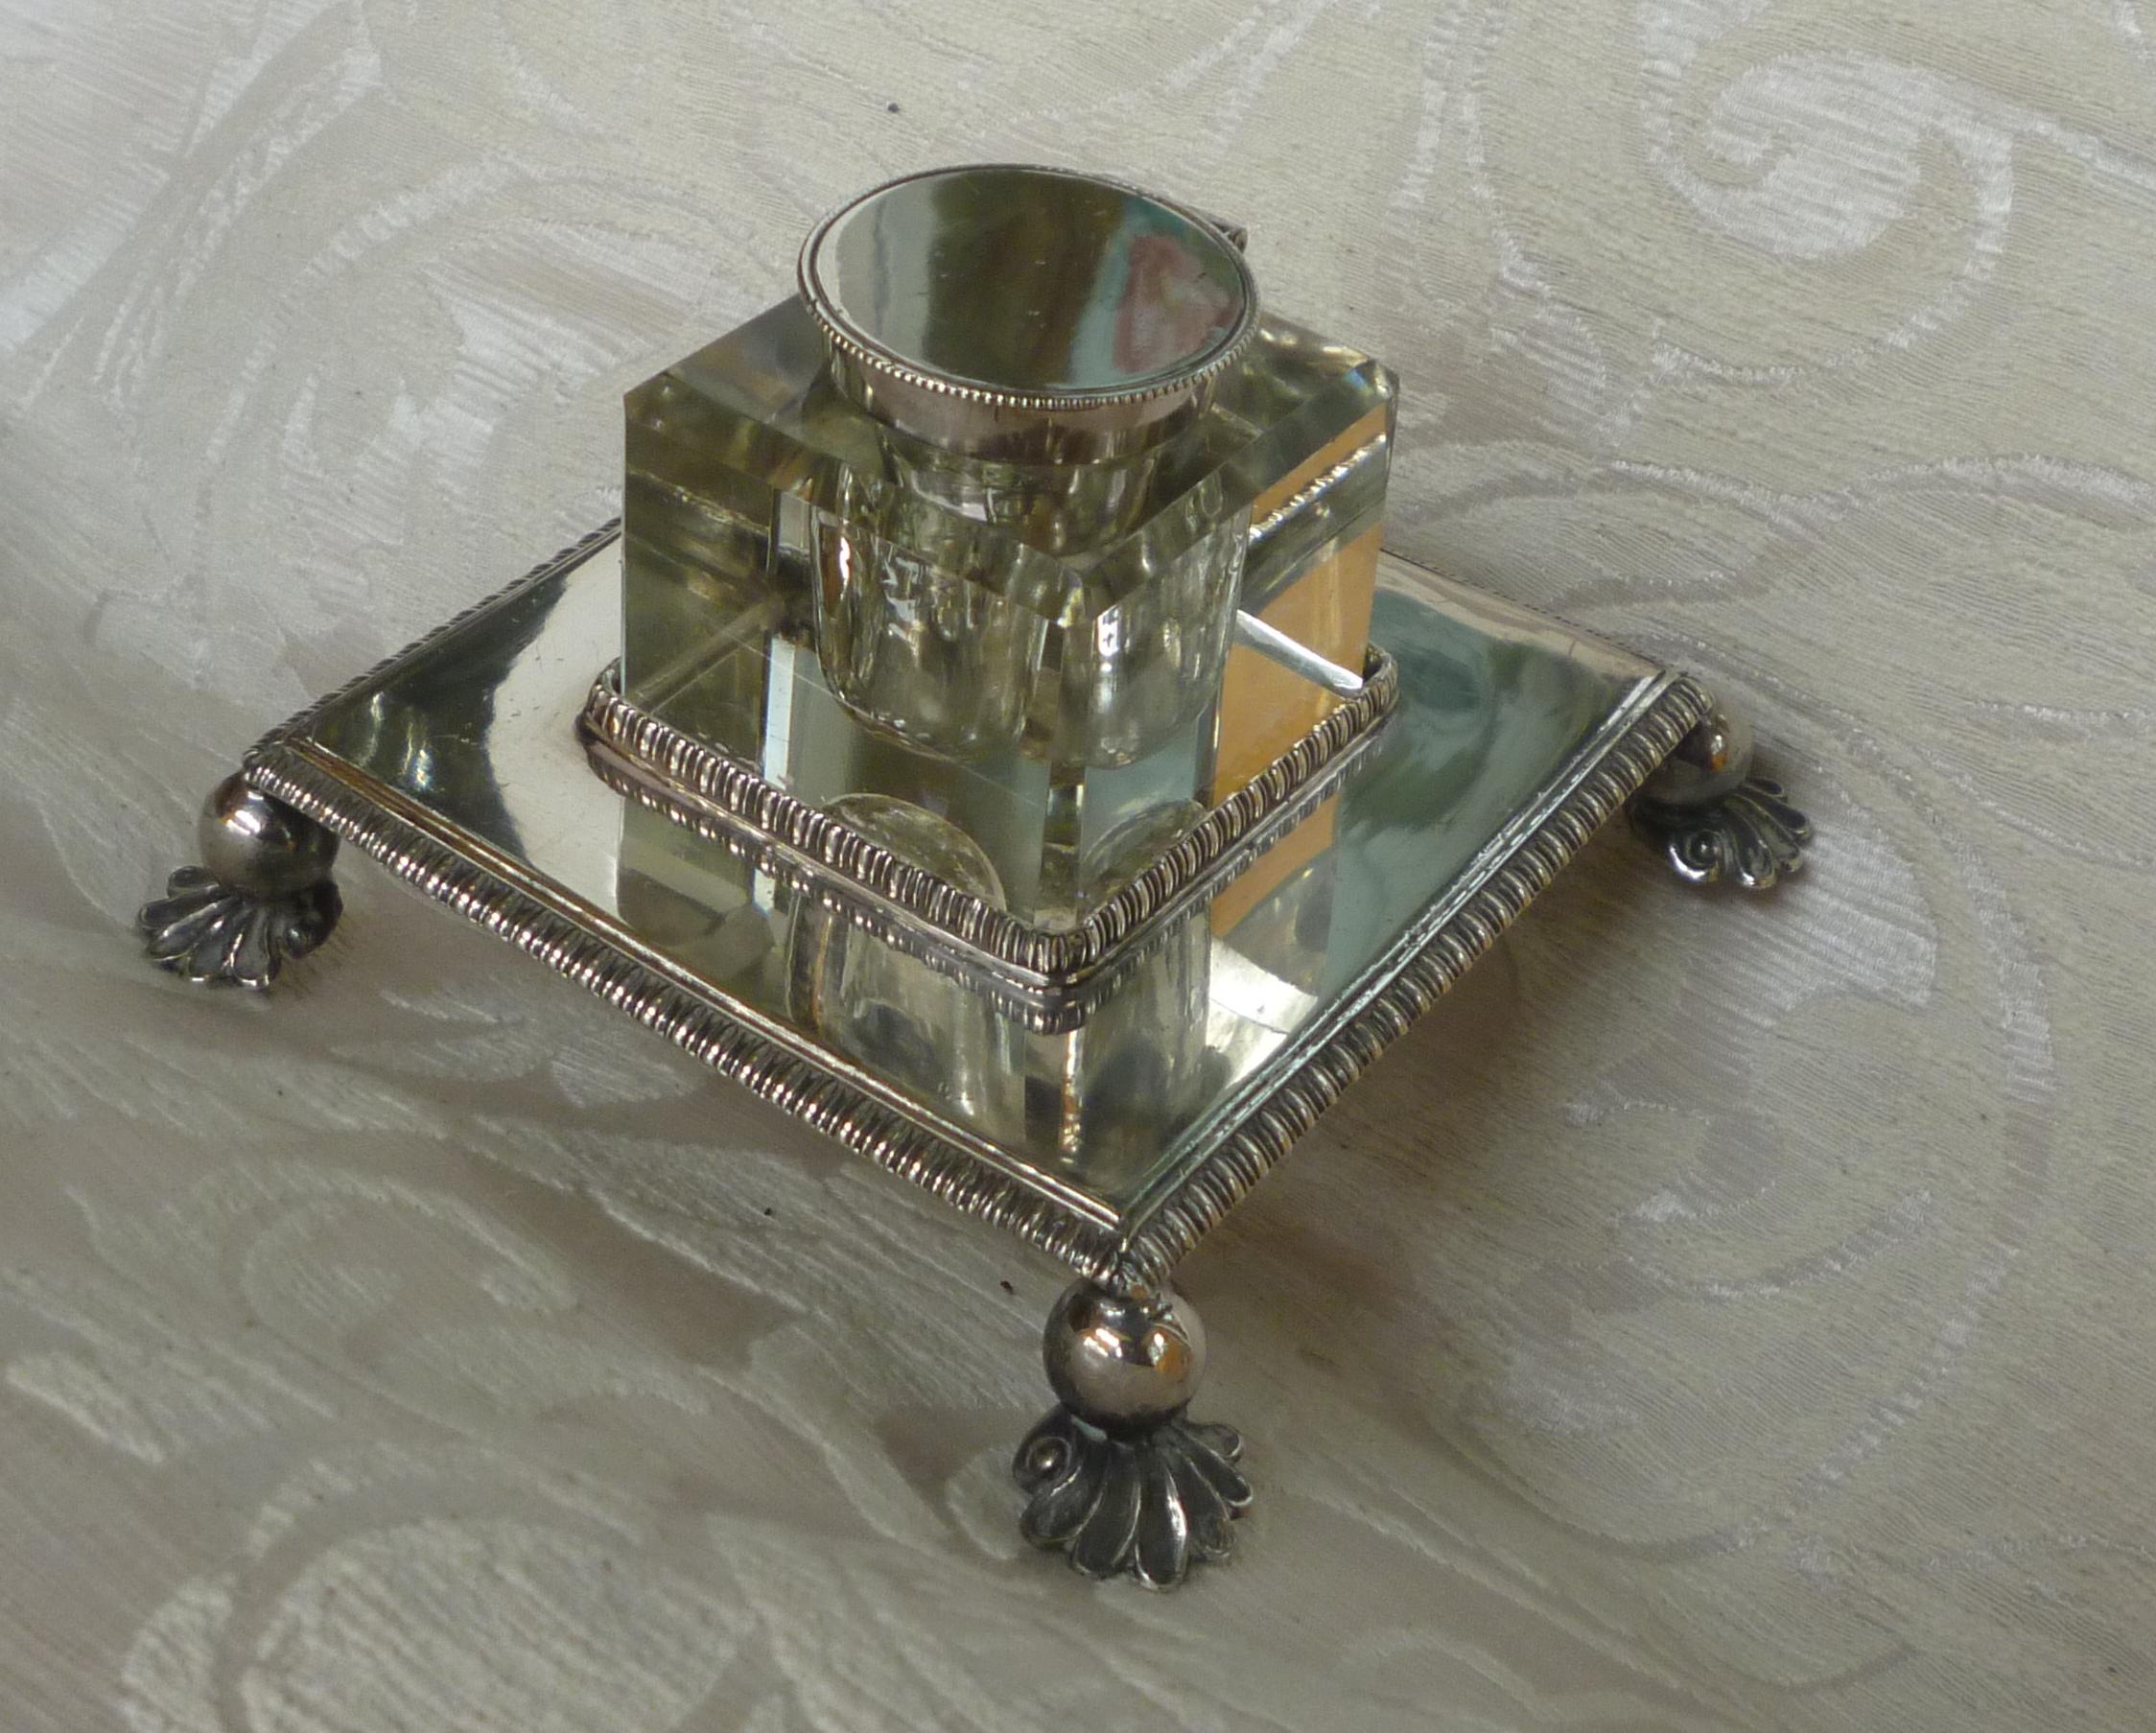 scaldacucchiaio, vaso argento, calamaio inglese calamaio danese 024